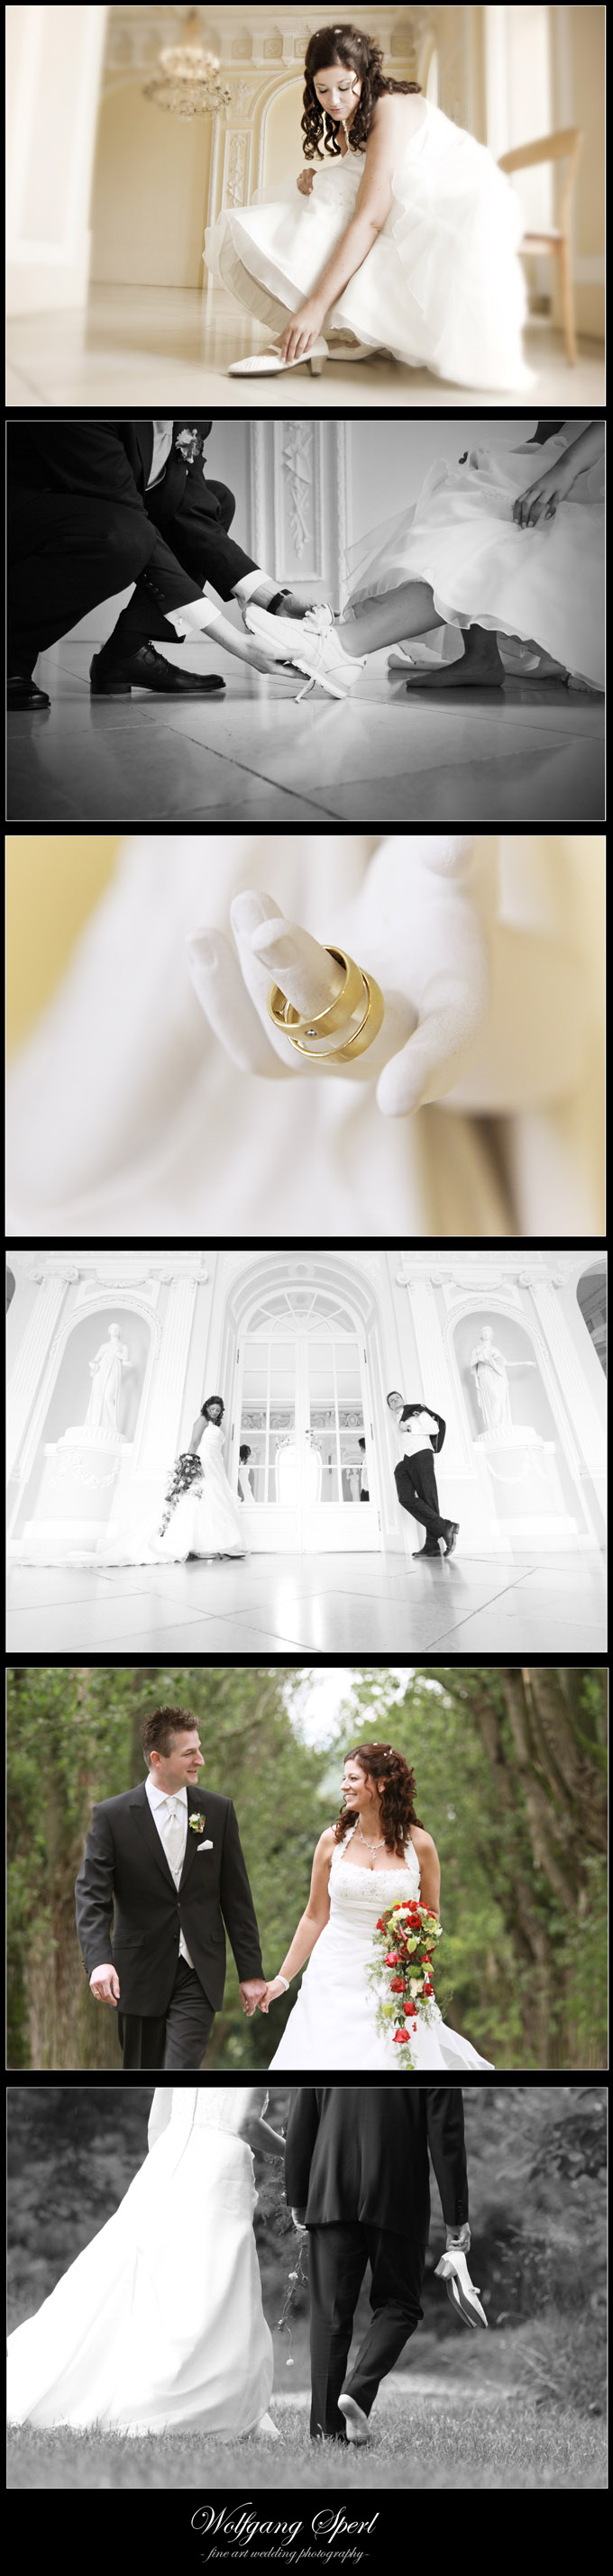 Fotograf Schloss Hohenheim Speisemeisterei Hochzeit